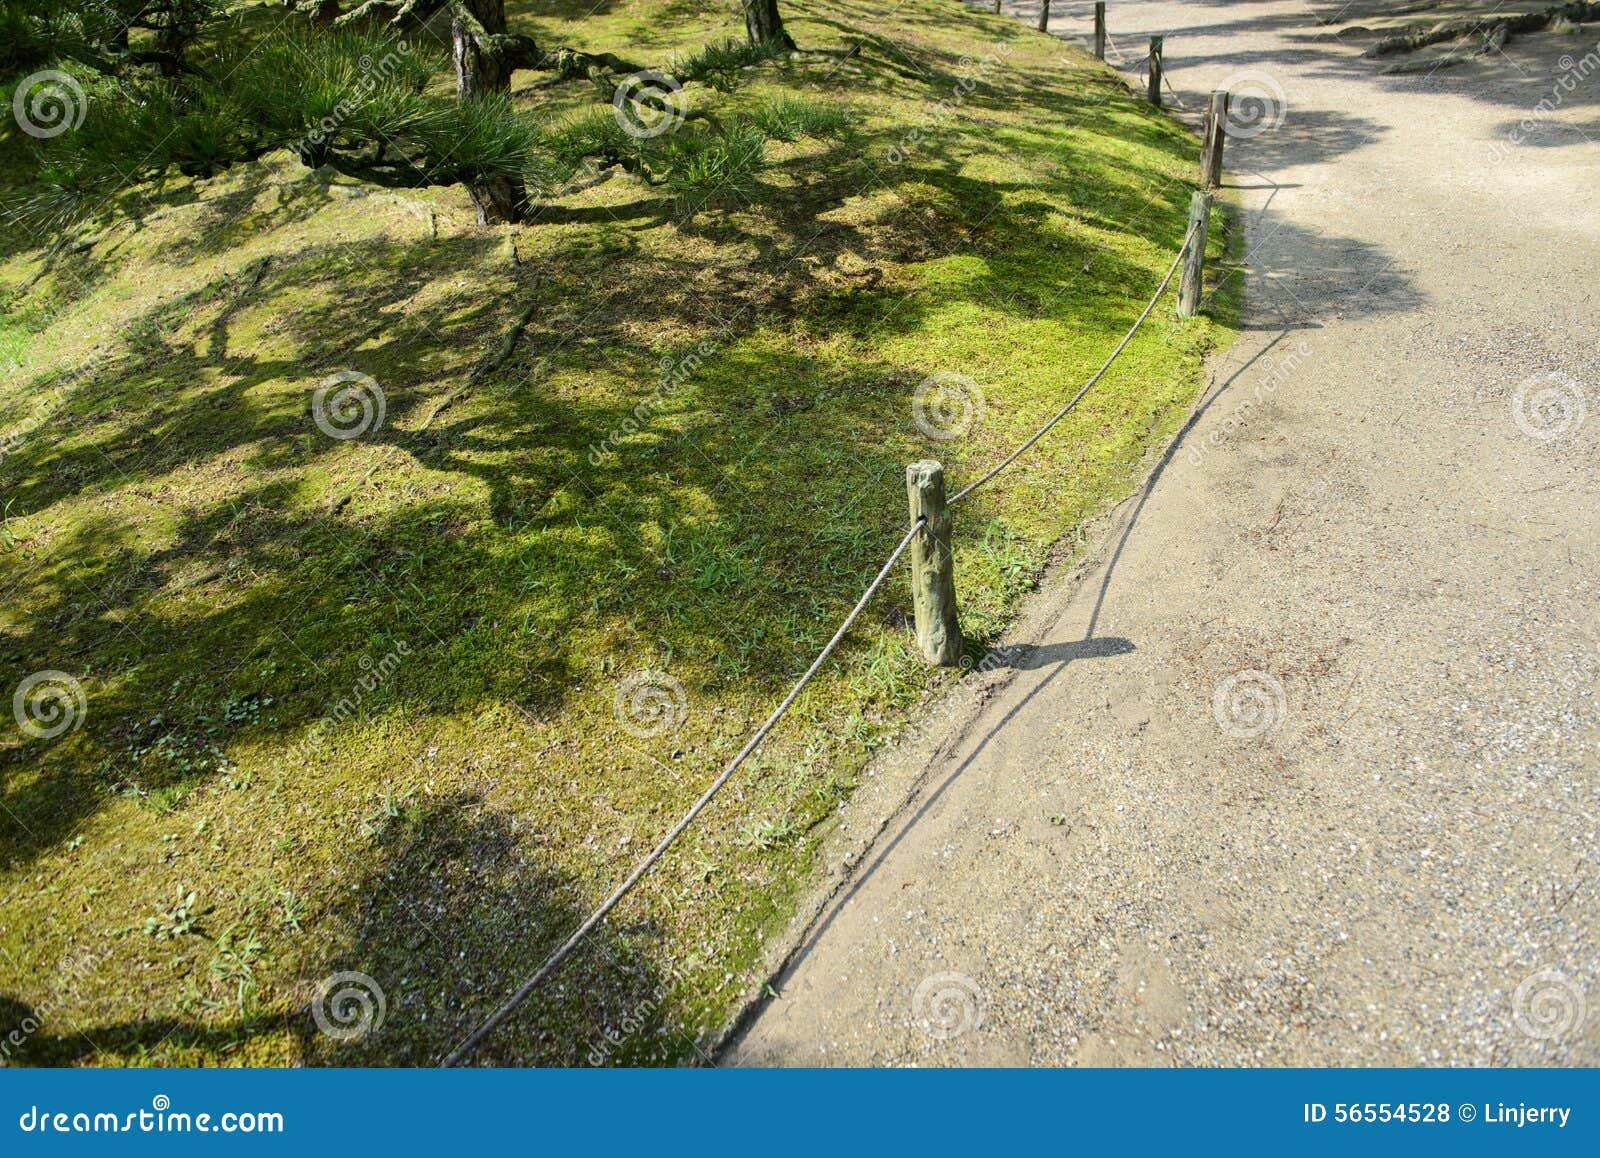 Download Ιαπωνικός κήπος με το δέντρο πεύκων Στοκ Εικόνες - εικόνα από ιαπωνικά, φυτά: 56554528